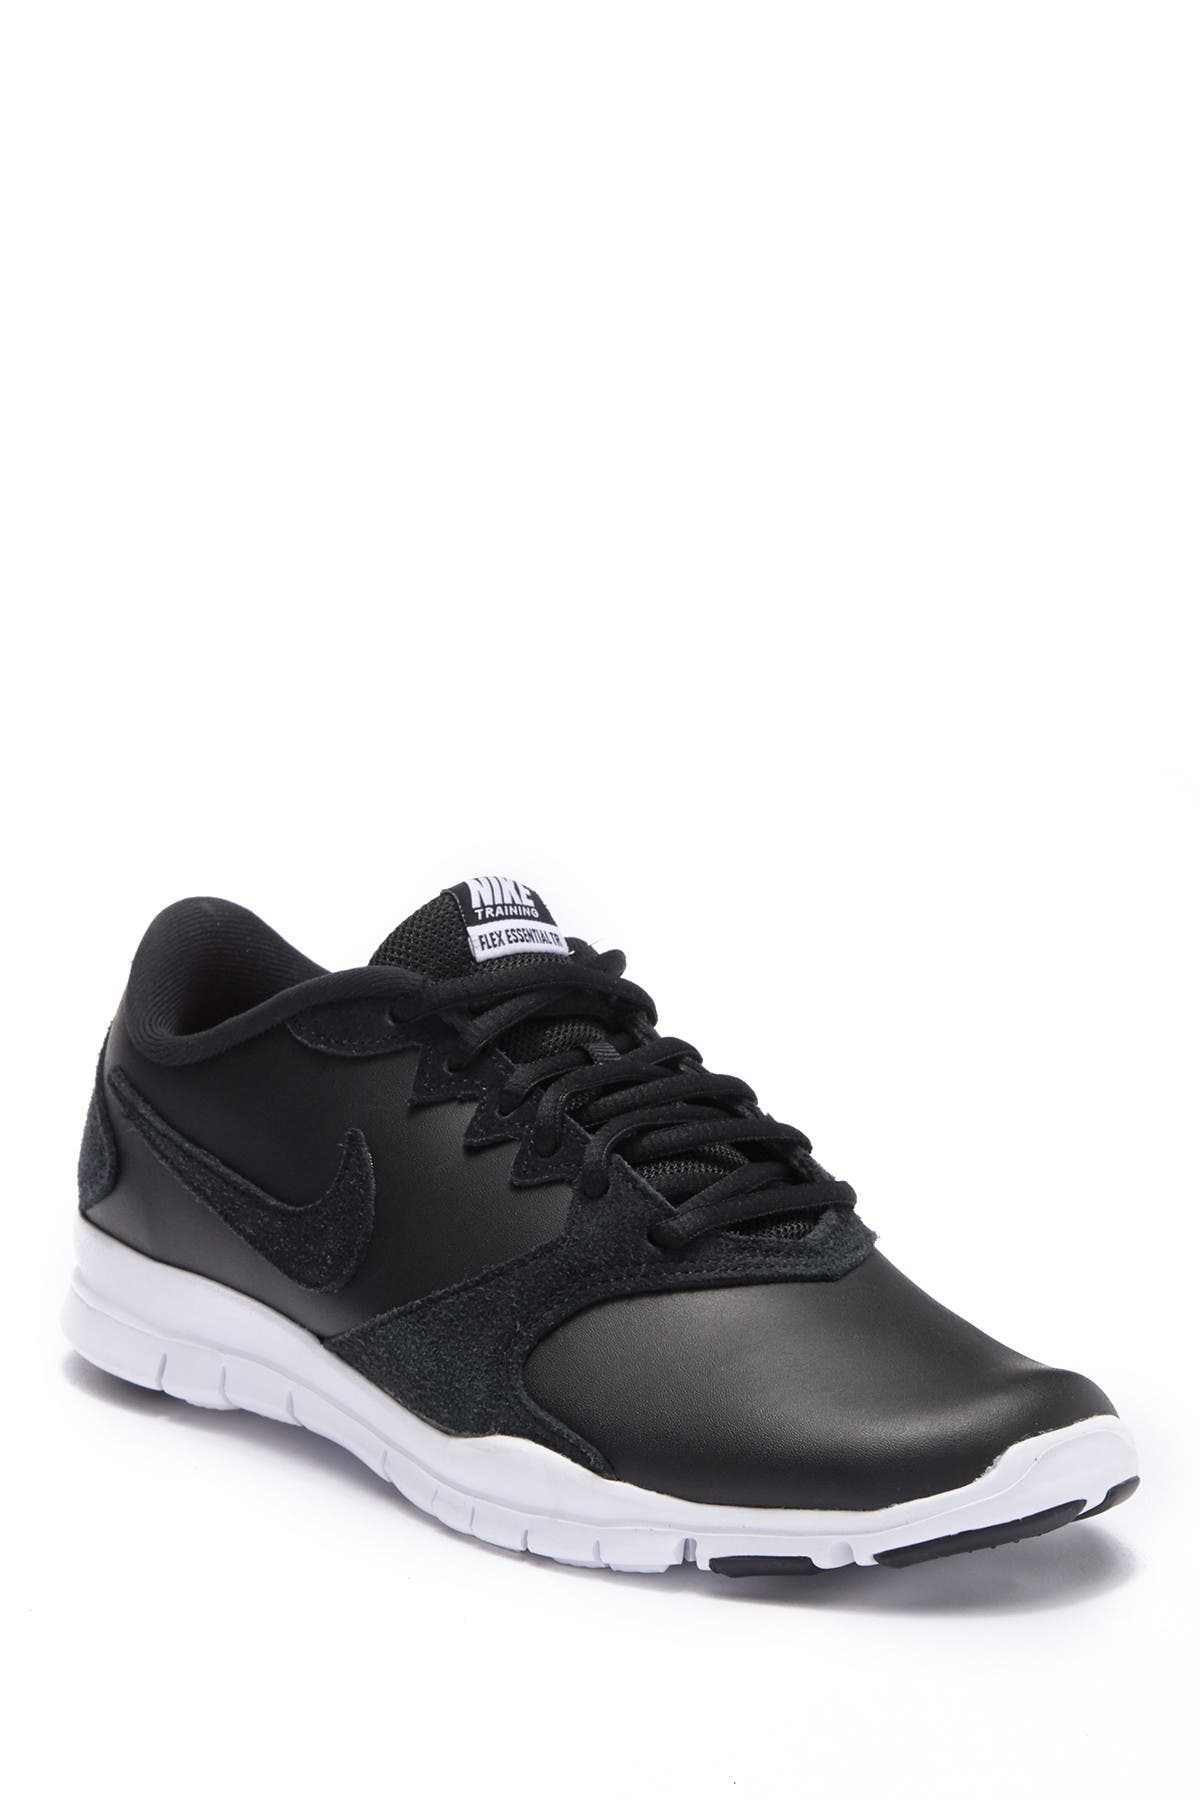 Nike | Flex Essential Trainer Sneaker